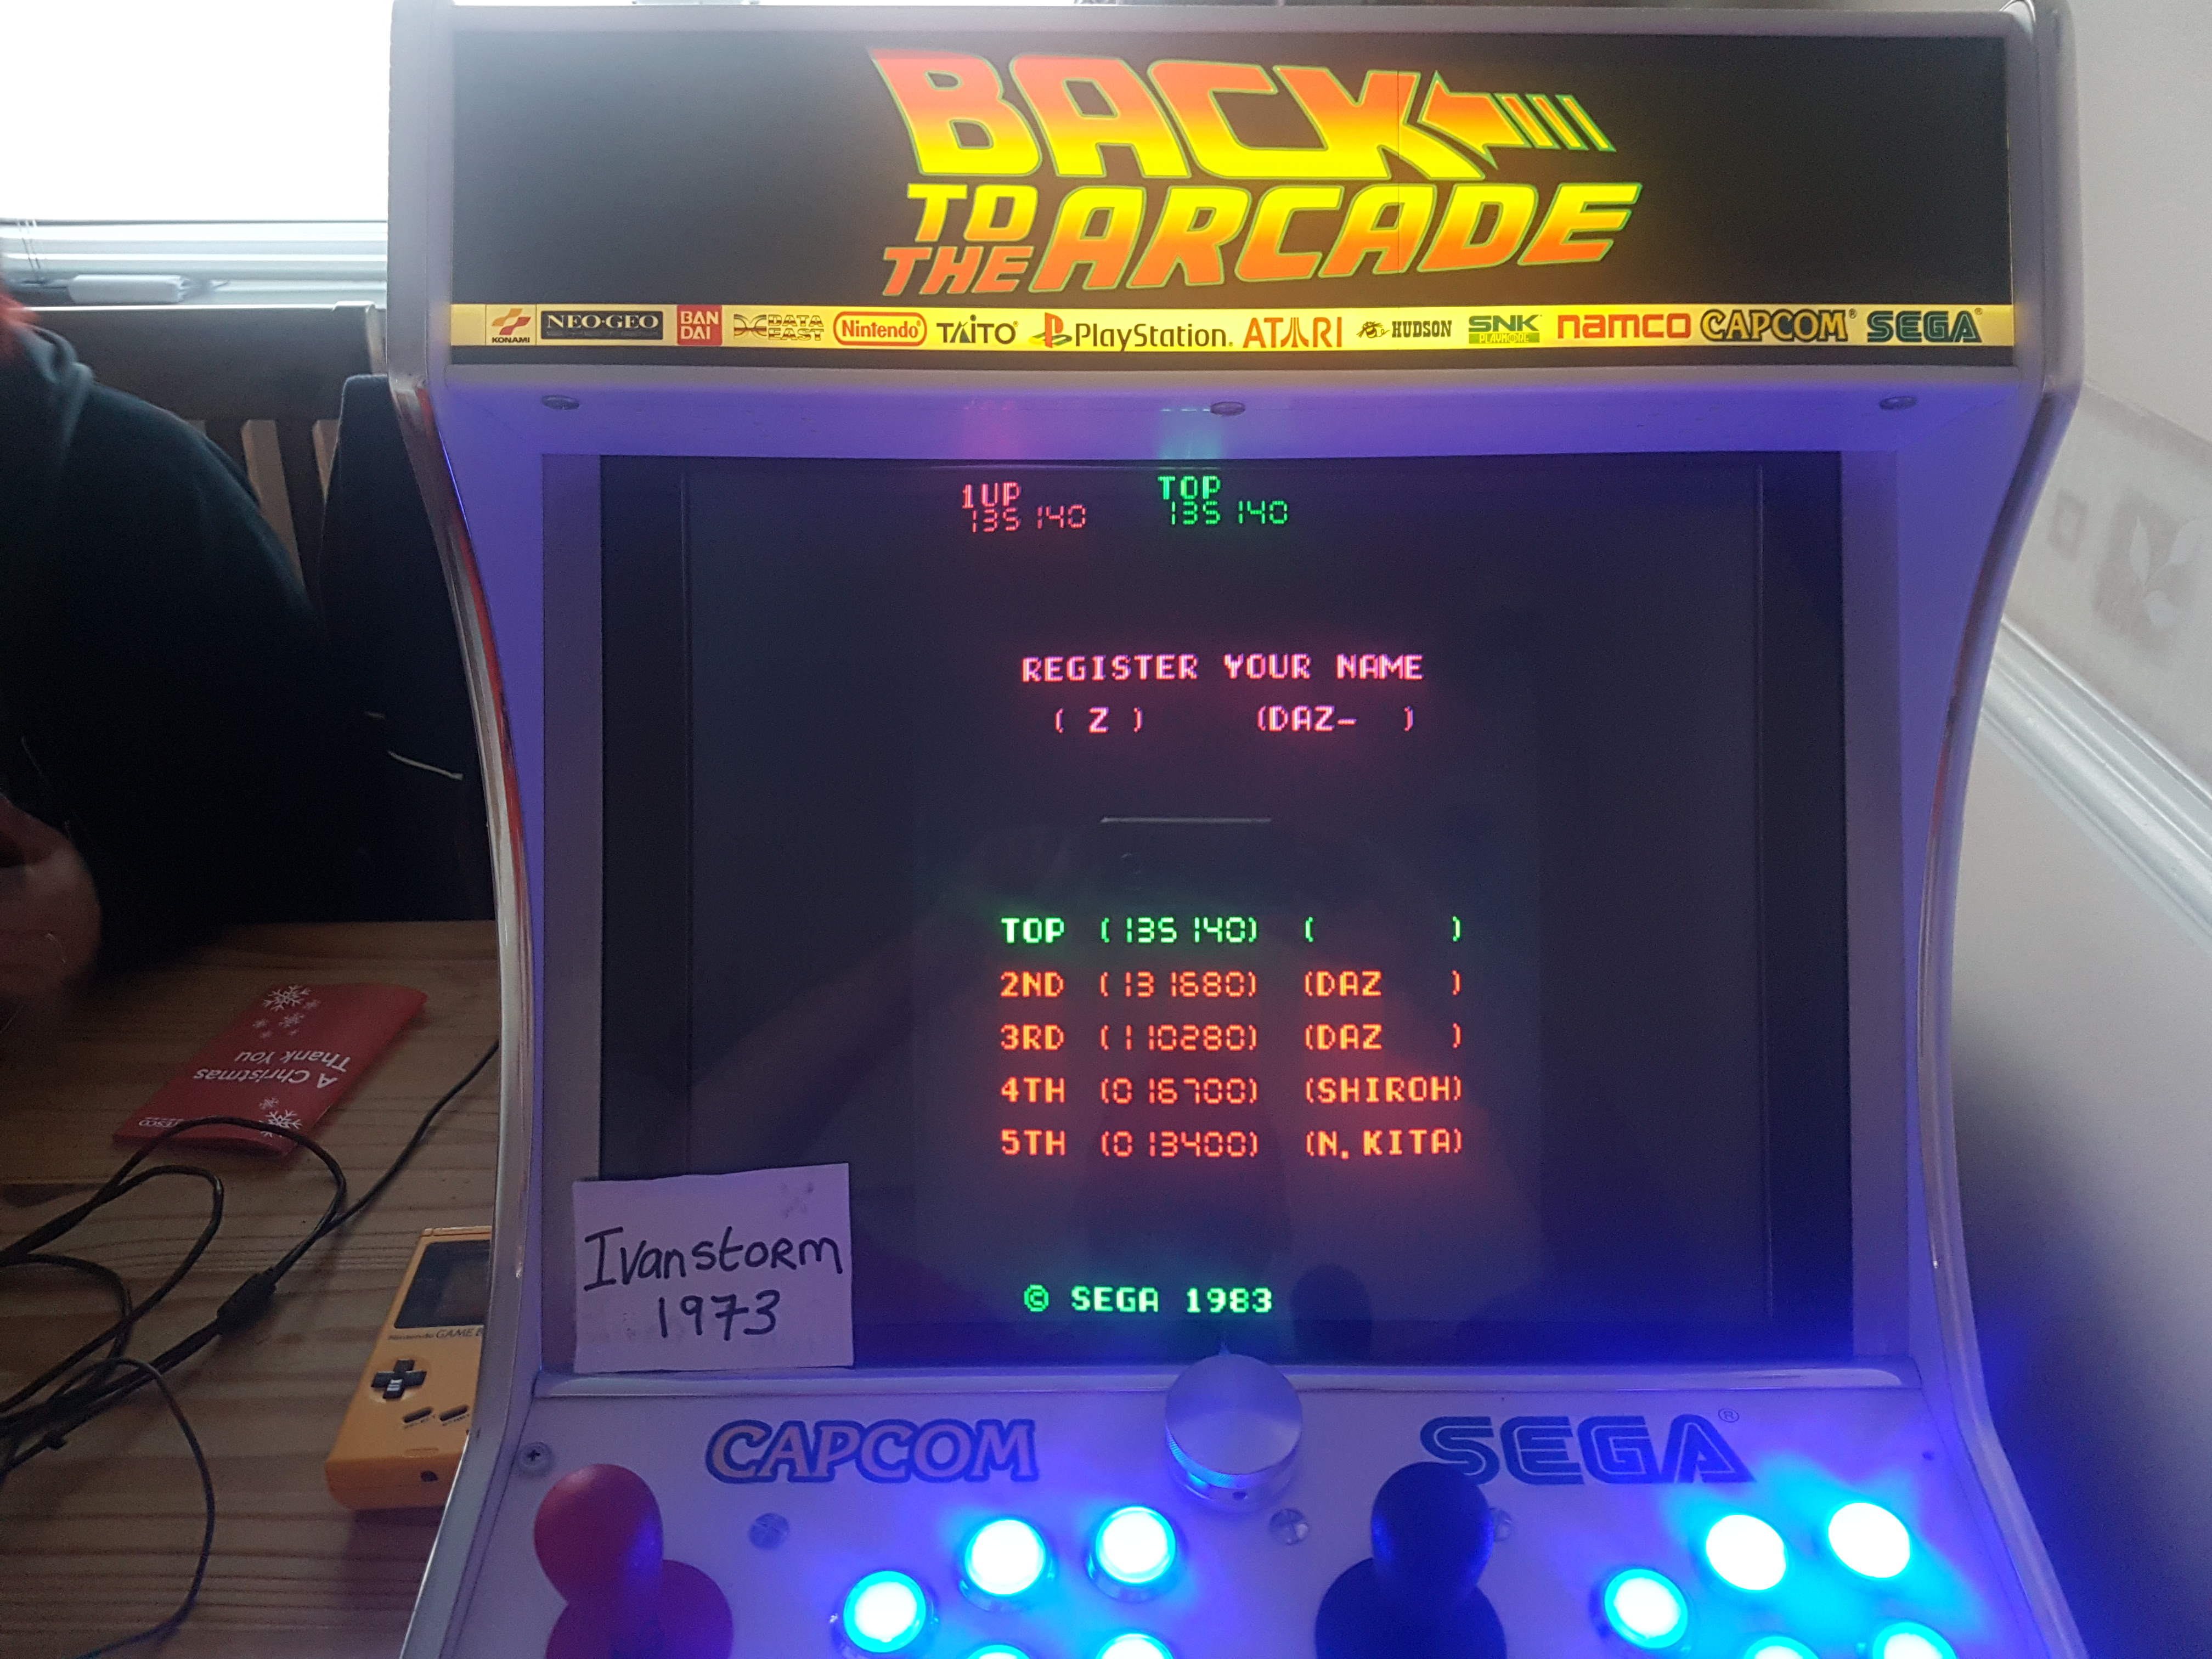 Ivanstorm1973: Hopper Robo [hopprobo] (Arcade Emulated / M.A.M.E.) 135,140 points on 2018-03-04 14:09:48